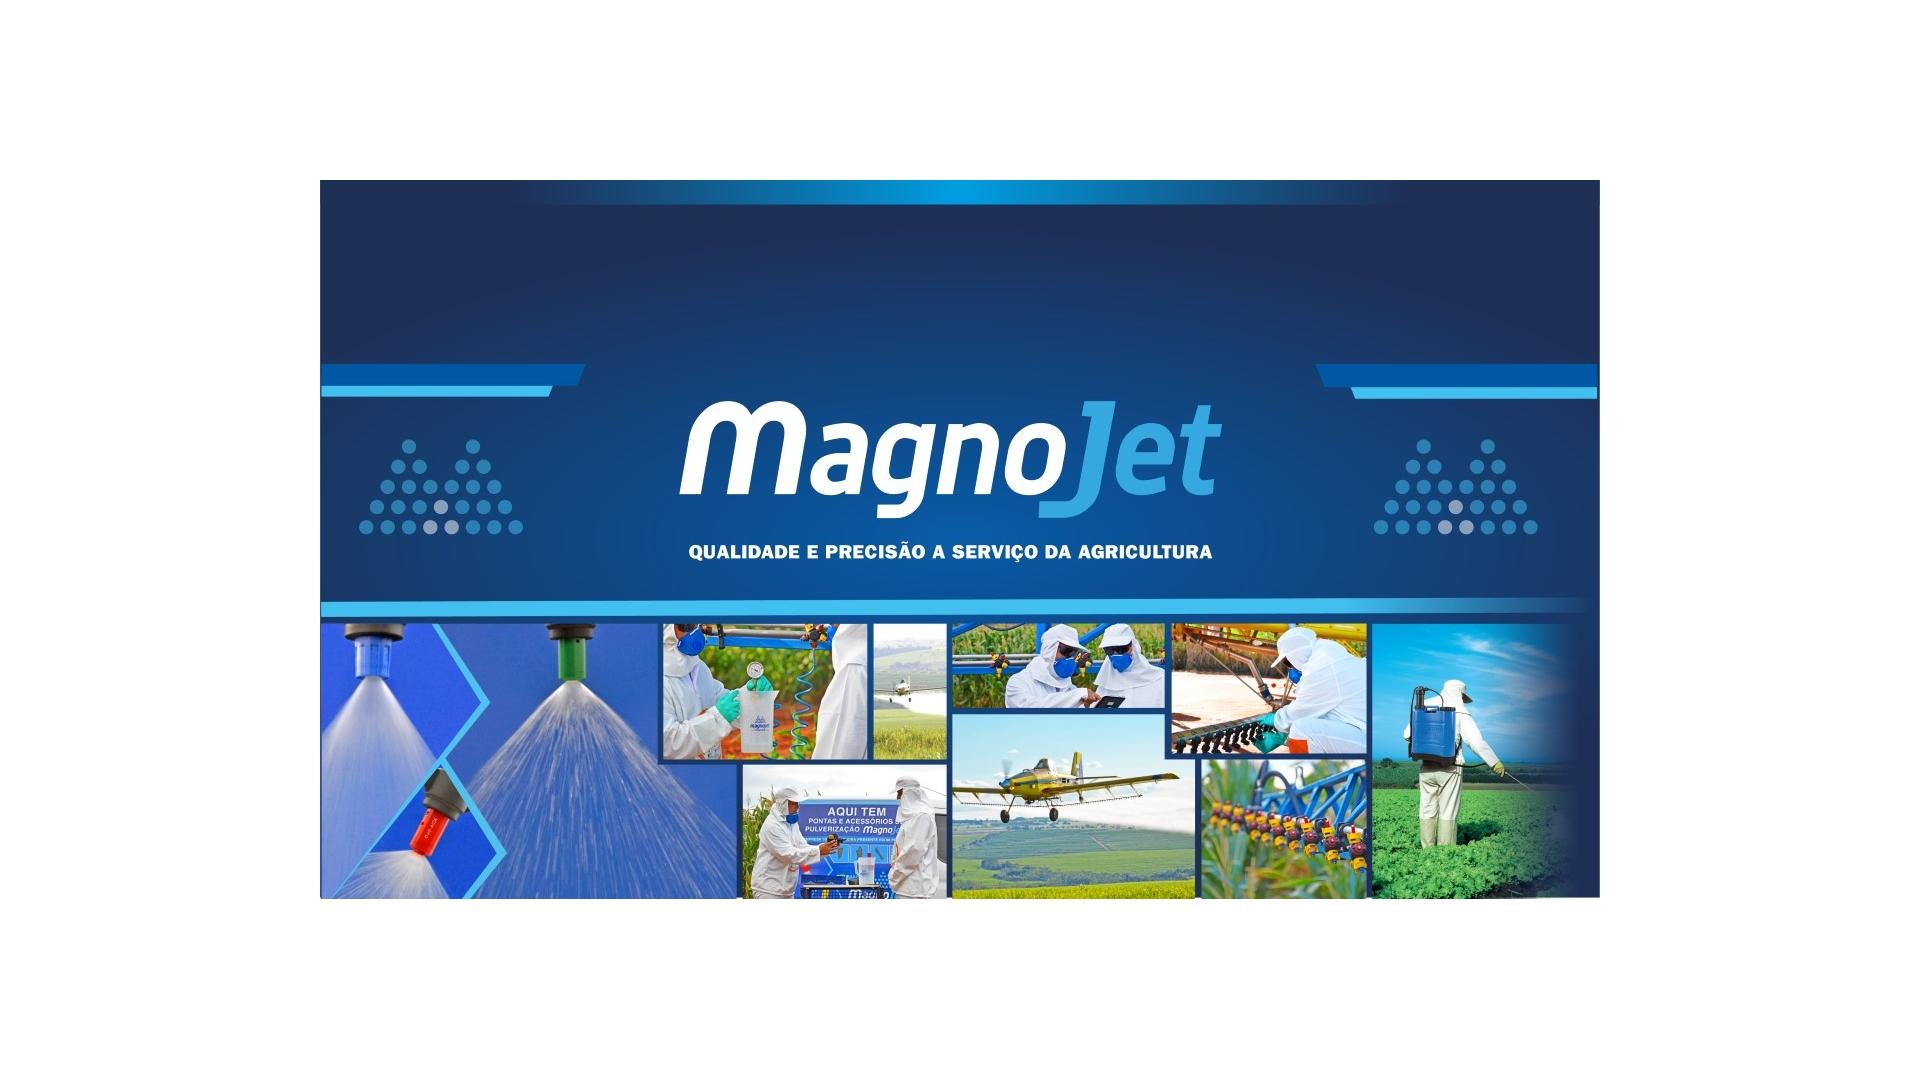 MagnoJet